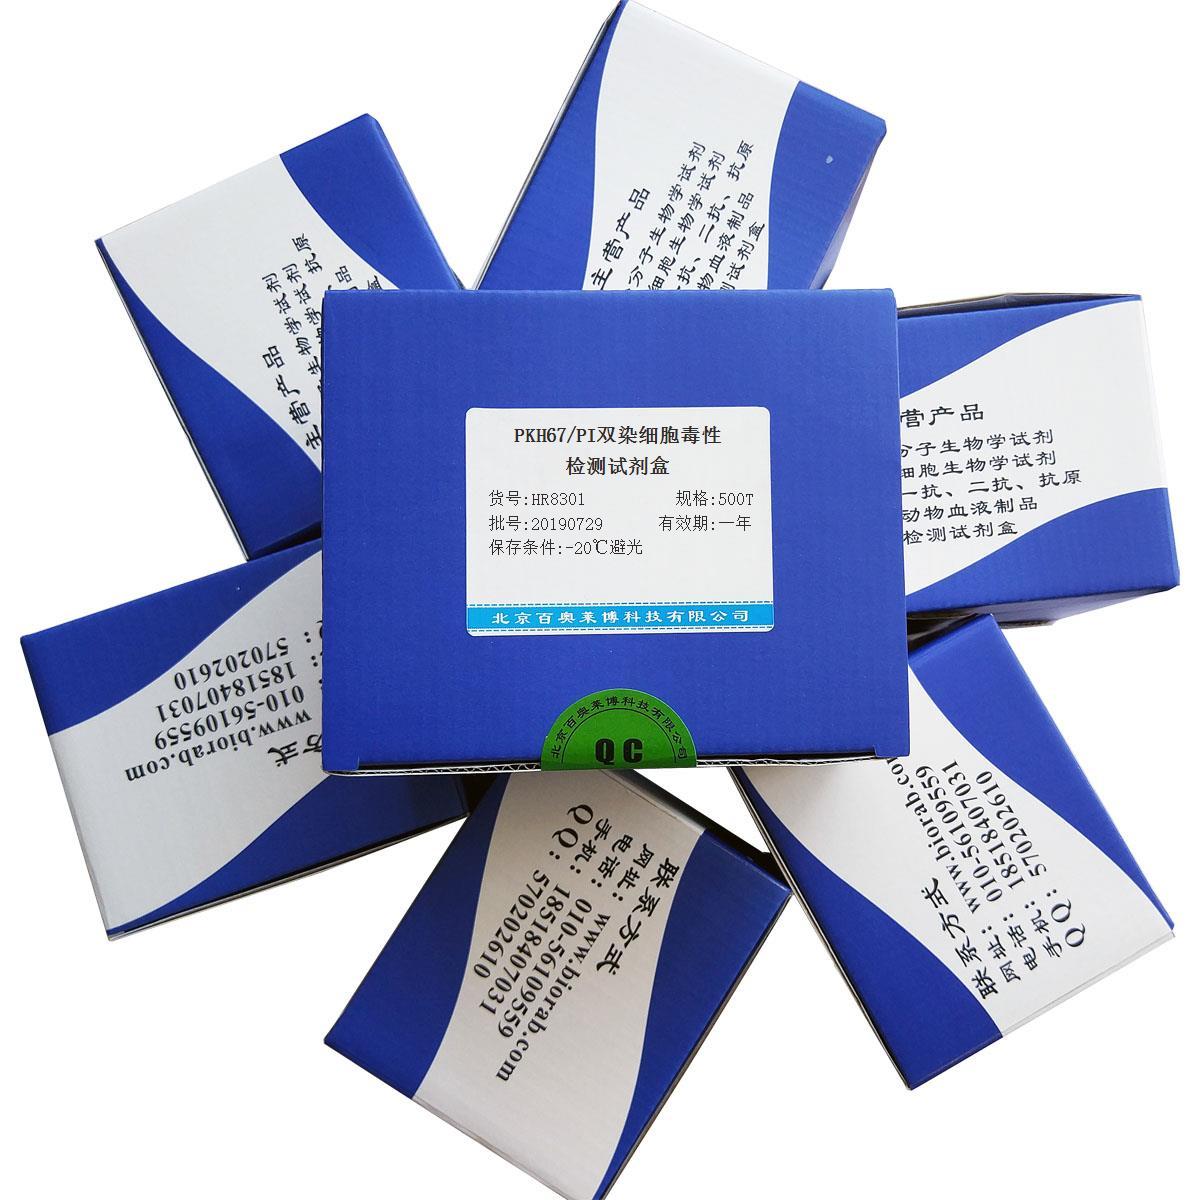 PKH67/PI双染细胞毒性检测试剂盒北京现货